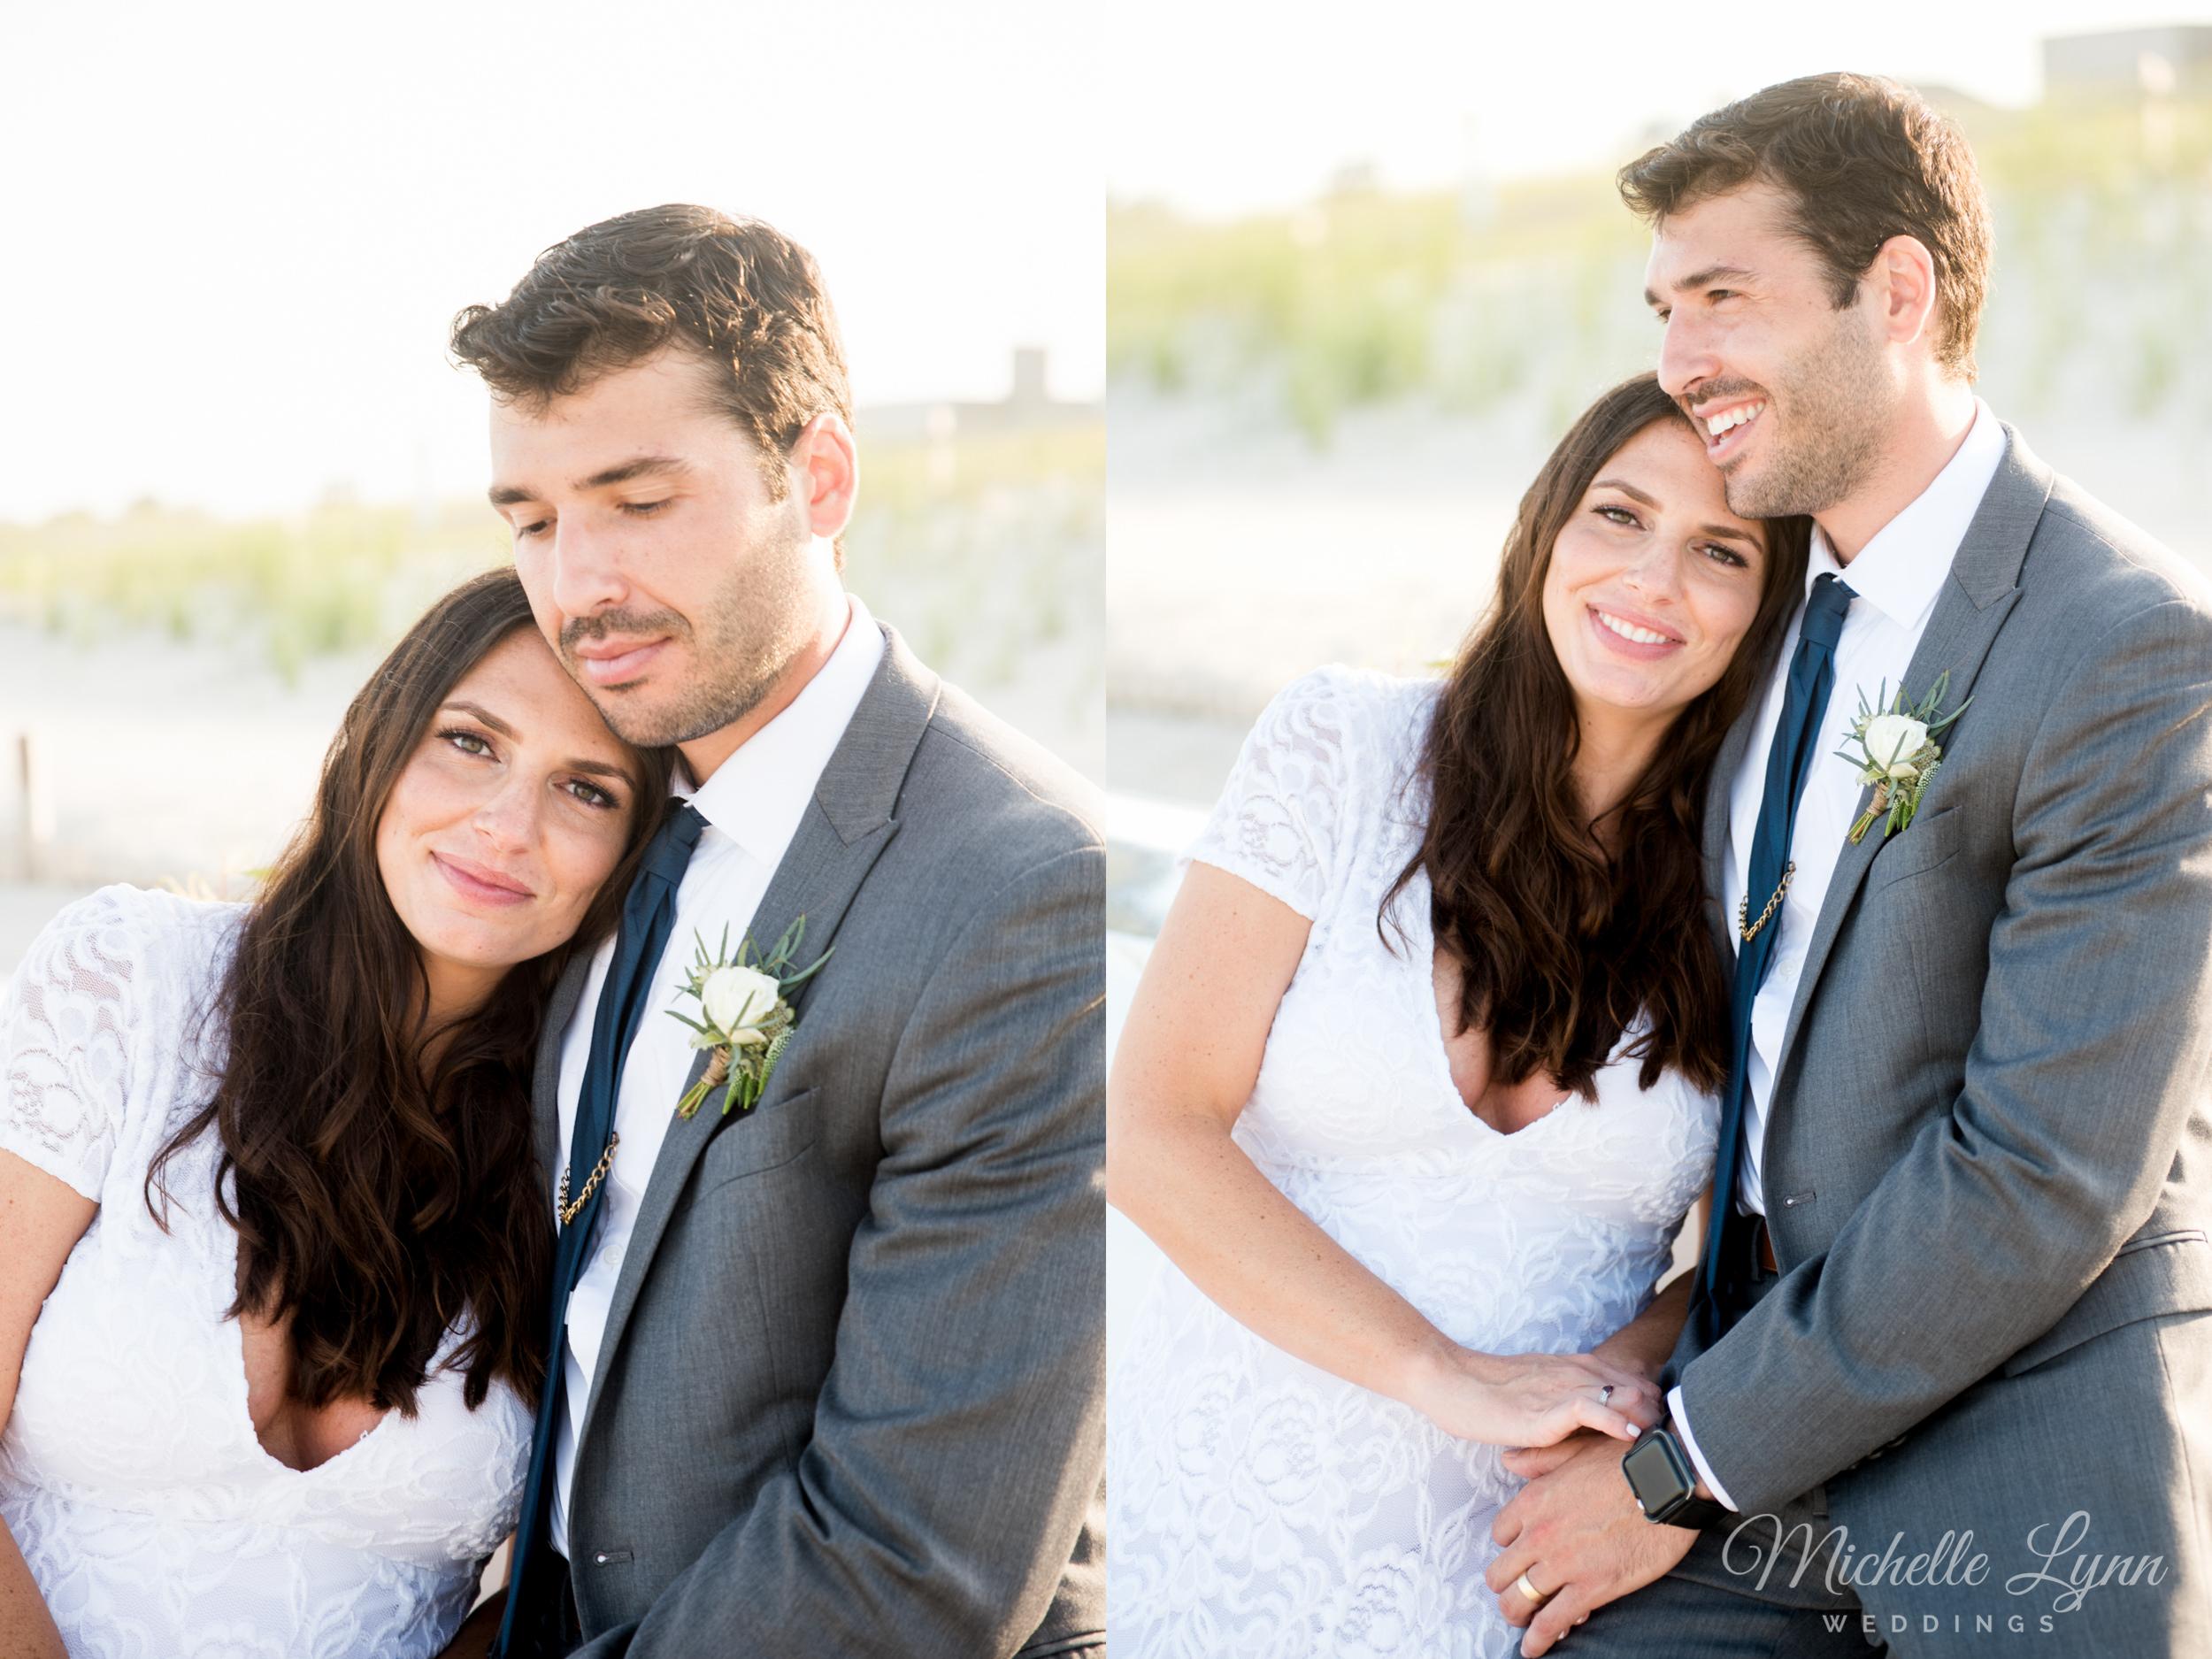 mlw-long-beach-island-new-jersey-wedding-photography-24.jpg